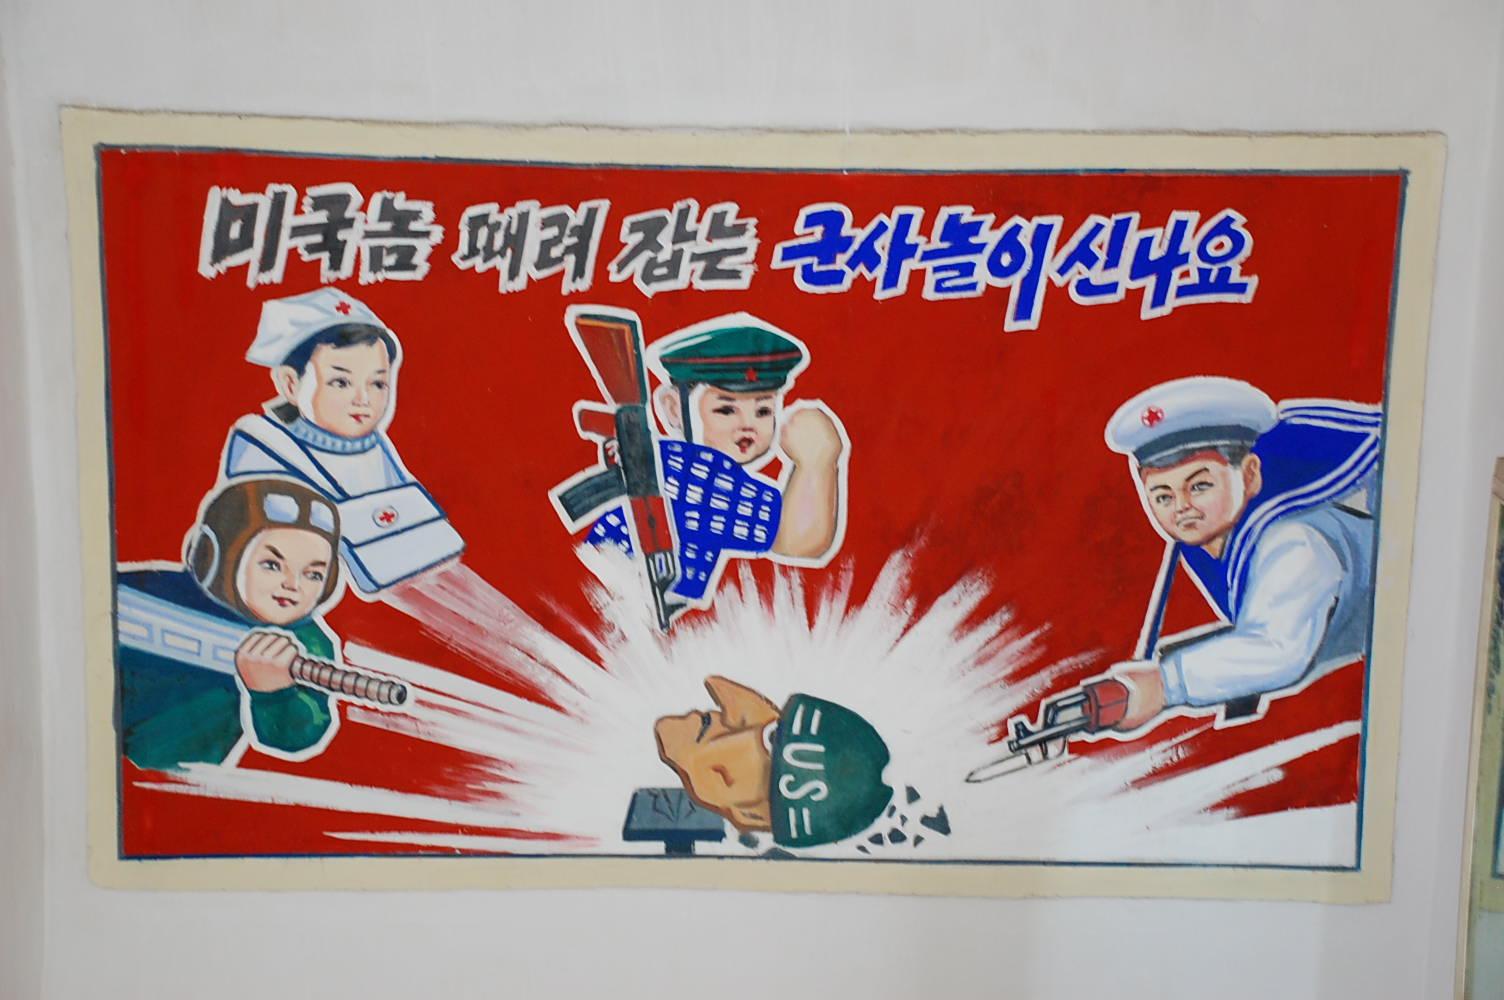 Propaganda poster in a primary school at the Chongsan-ri Farm, North Korea. Photo taken on June 10, 2008.